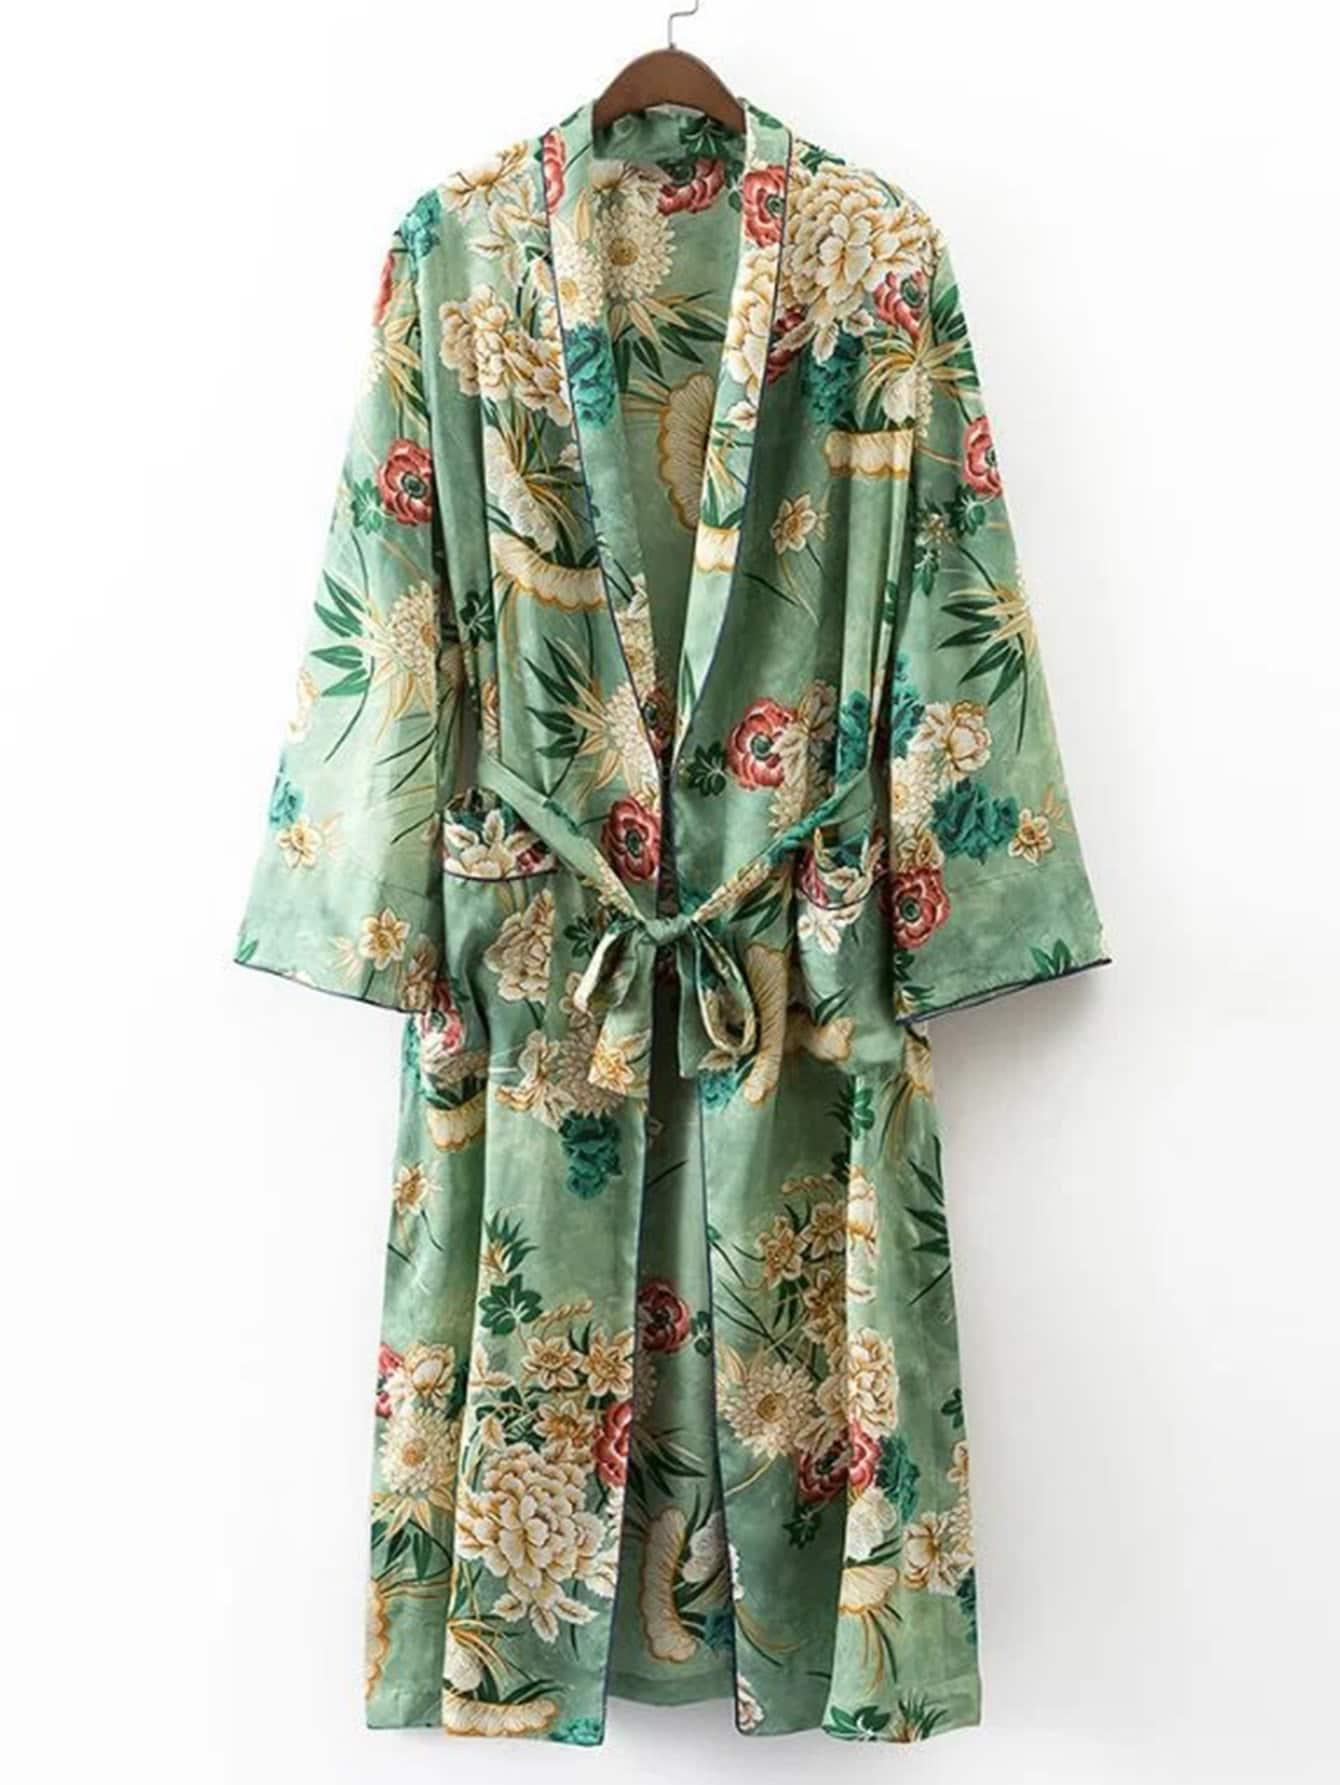 Calico Print Contrast Piping Self Tie Longline Kimono